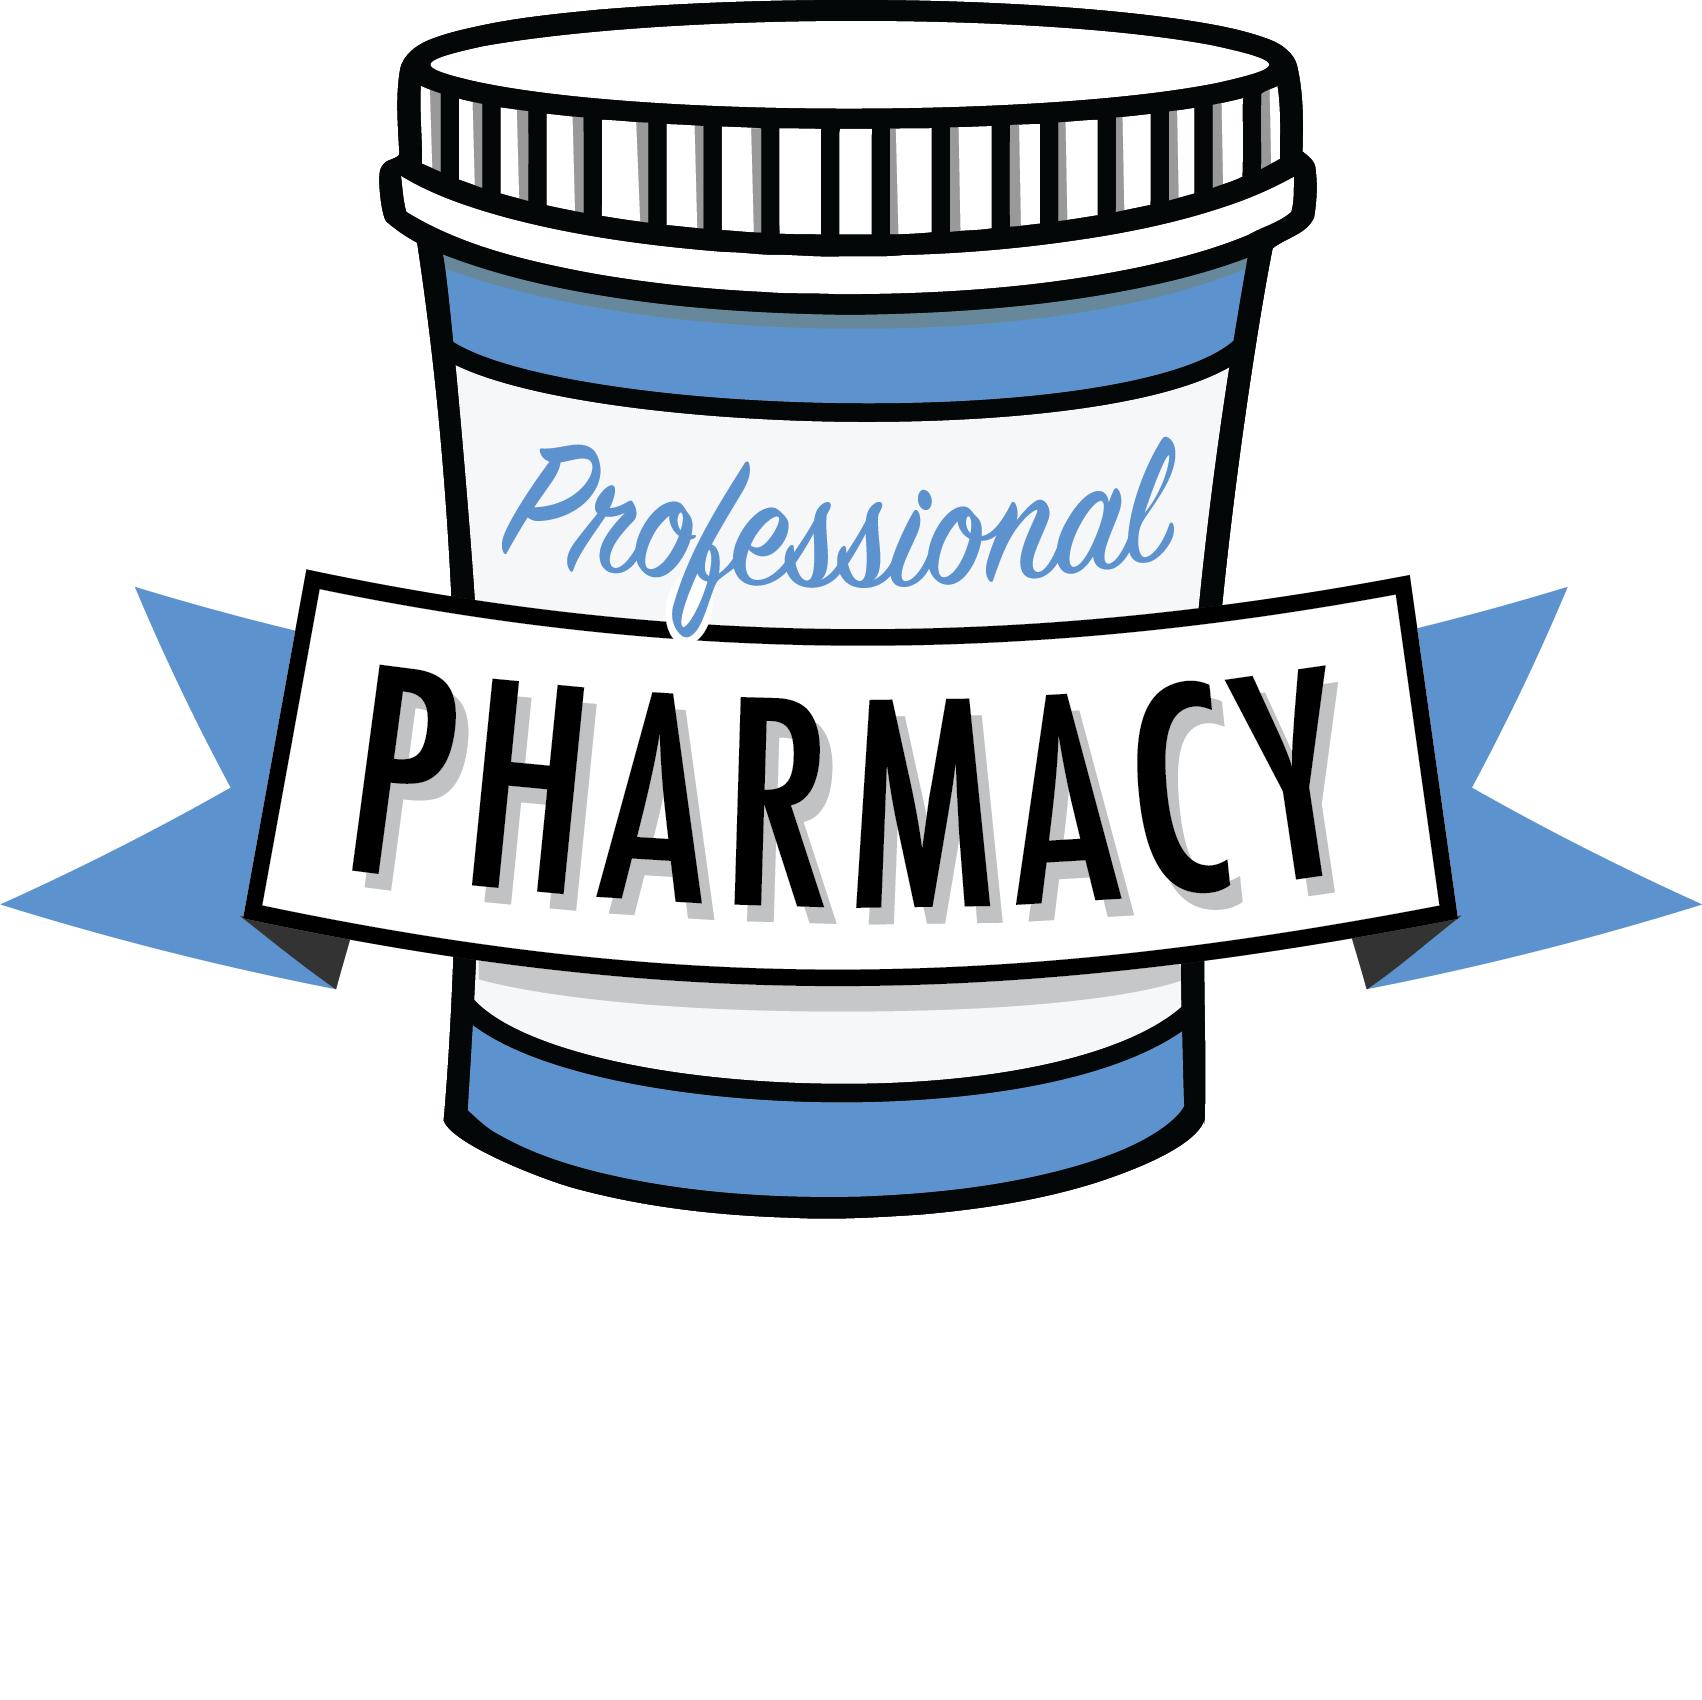 Medication clipart pharmasist. Pain management professional pharmacy